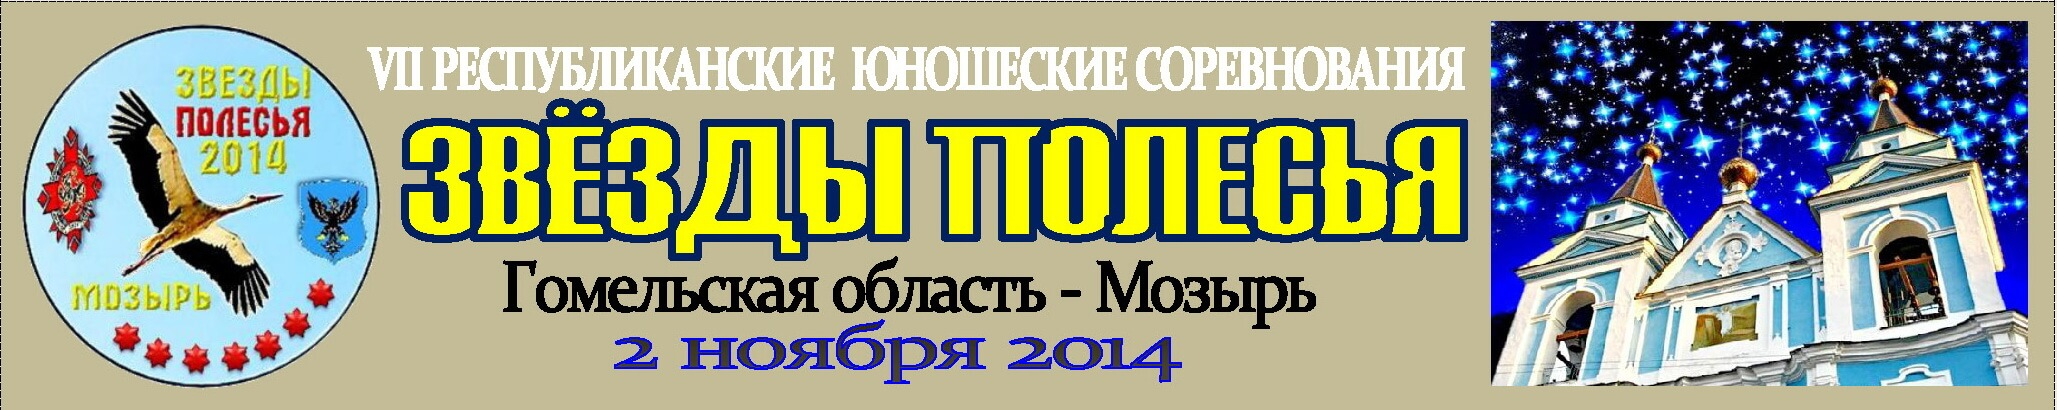 Мозырь-2014 Баннер